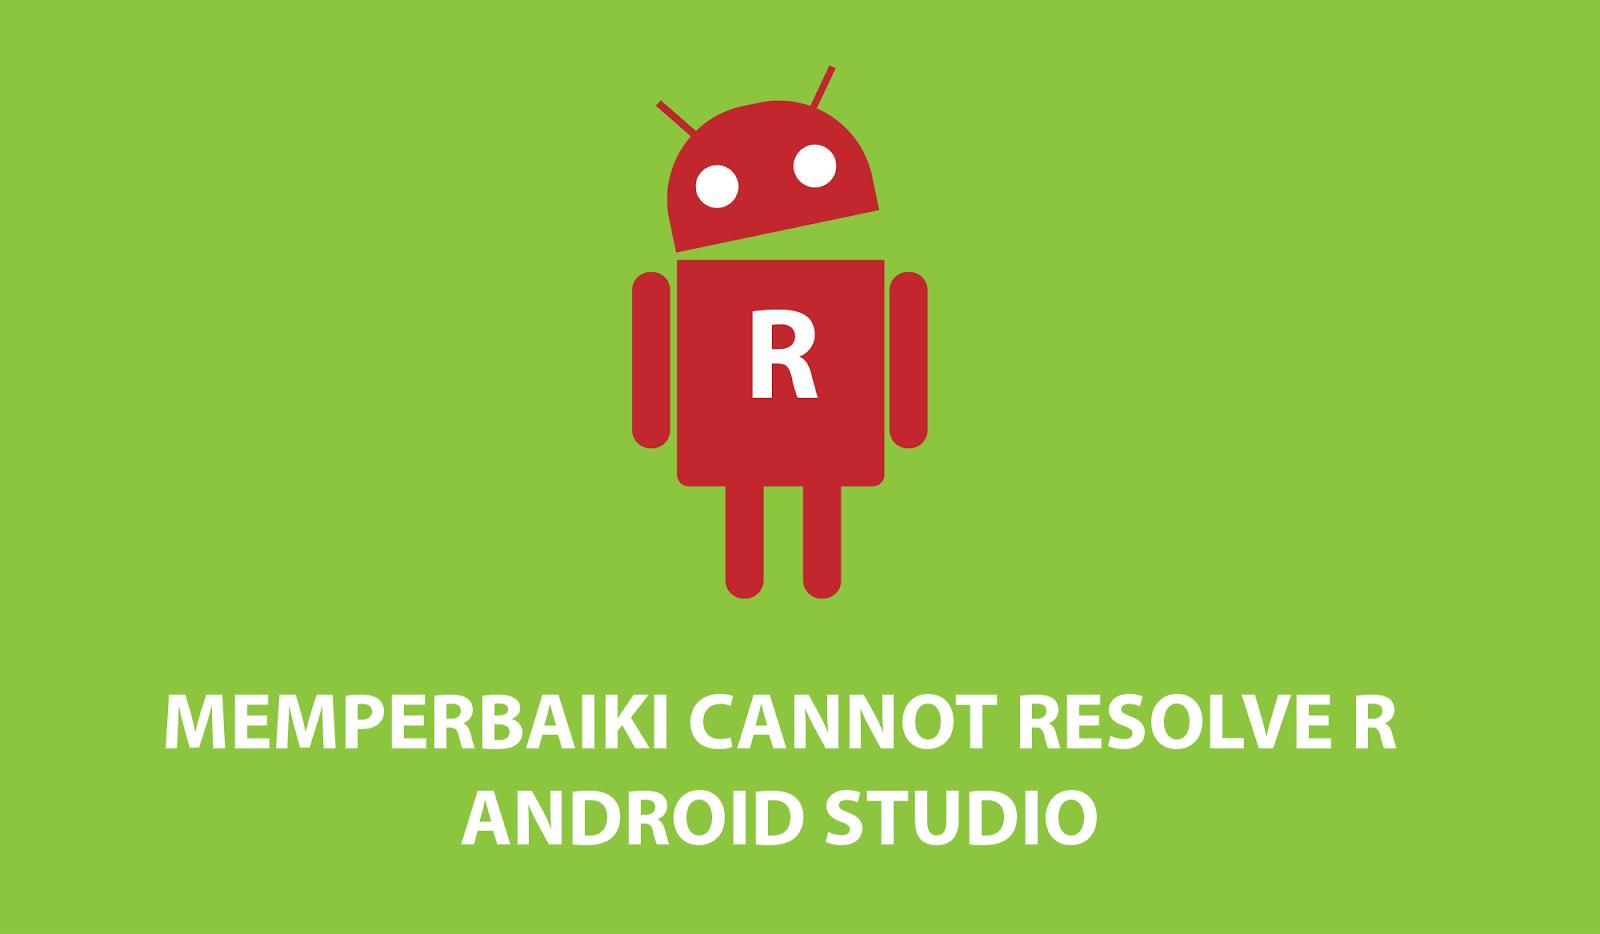 cannot resolve symbol r